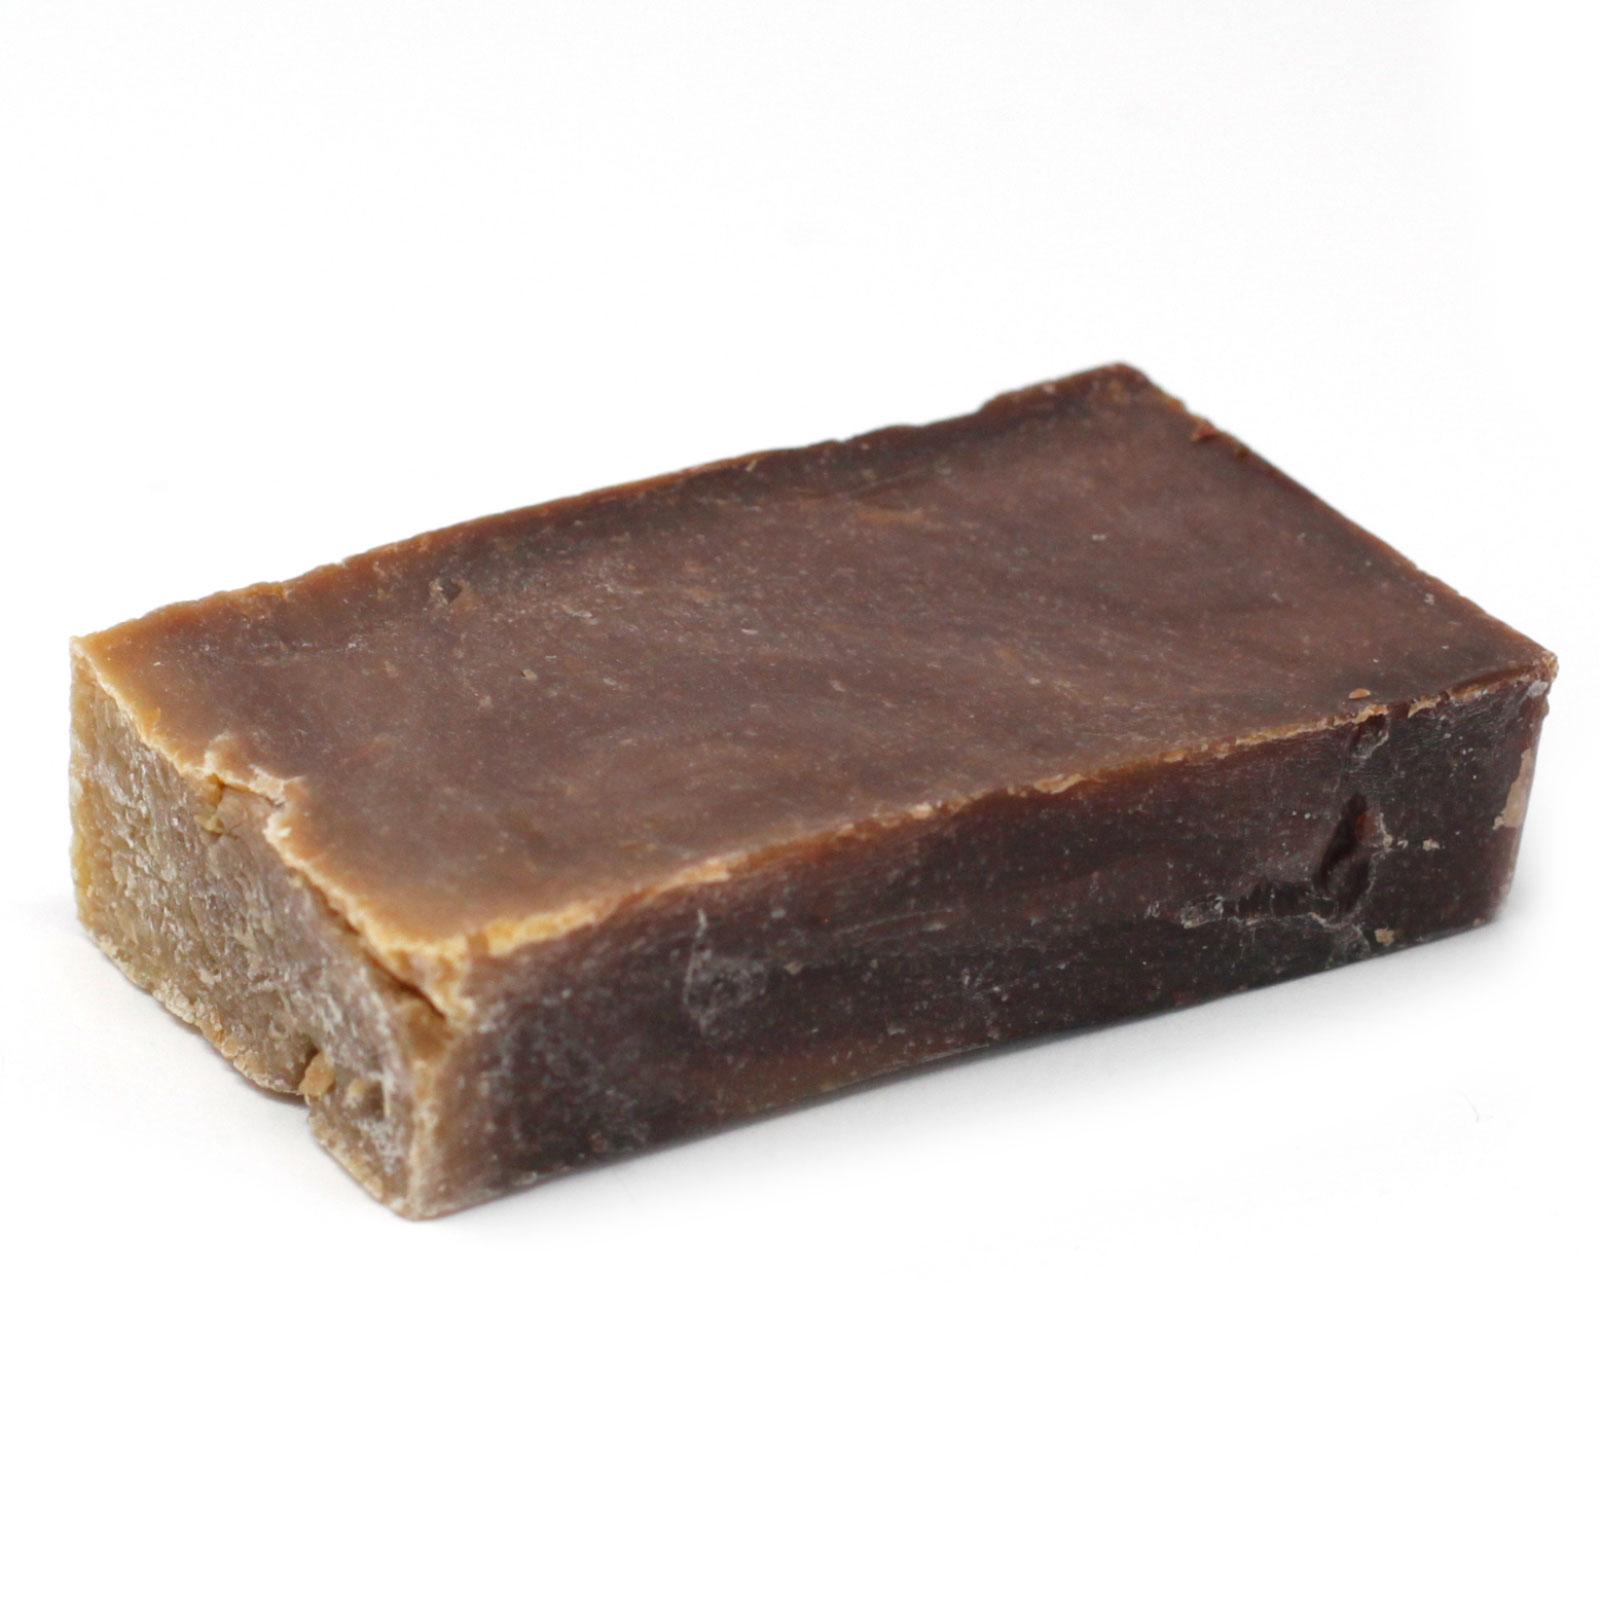 Vanilla Olive Oil Soap SLICE approx 100g